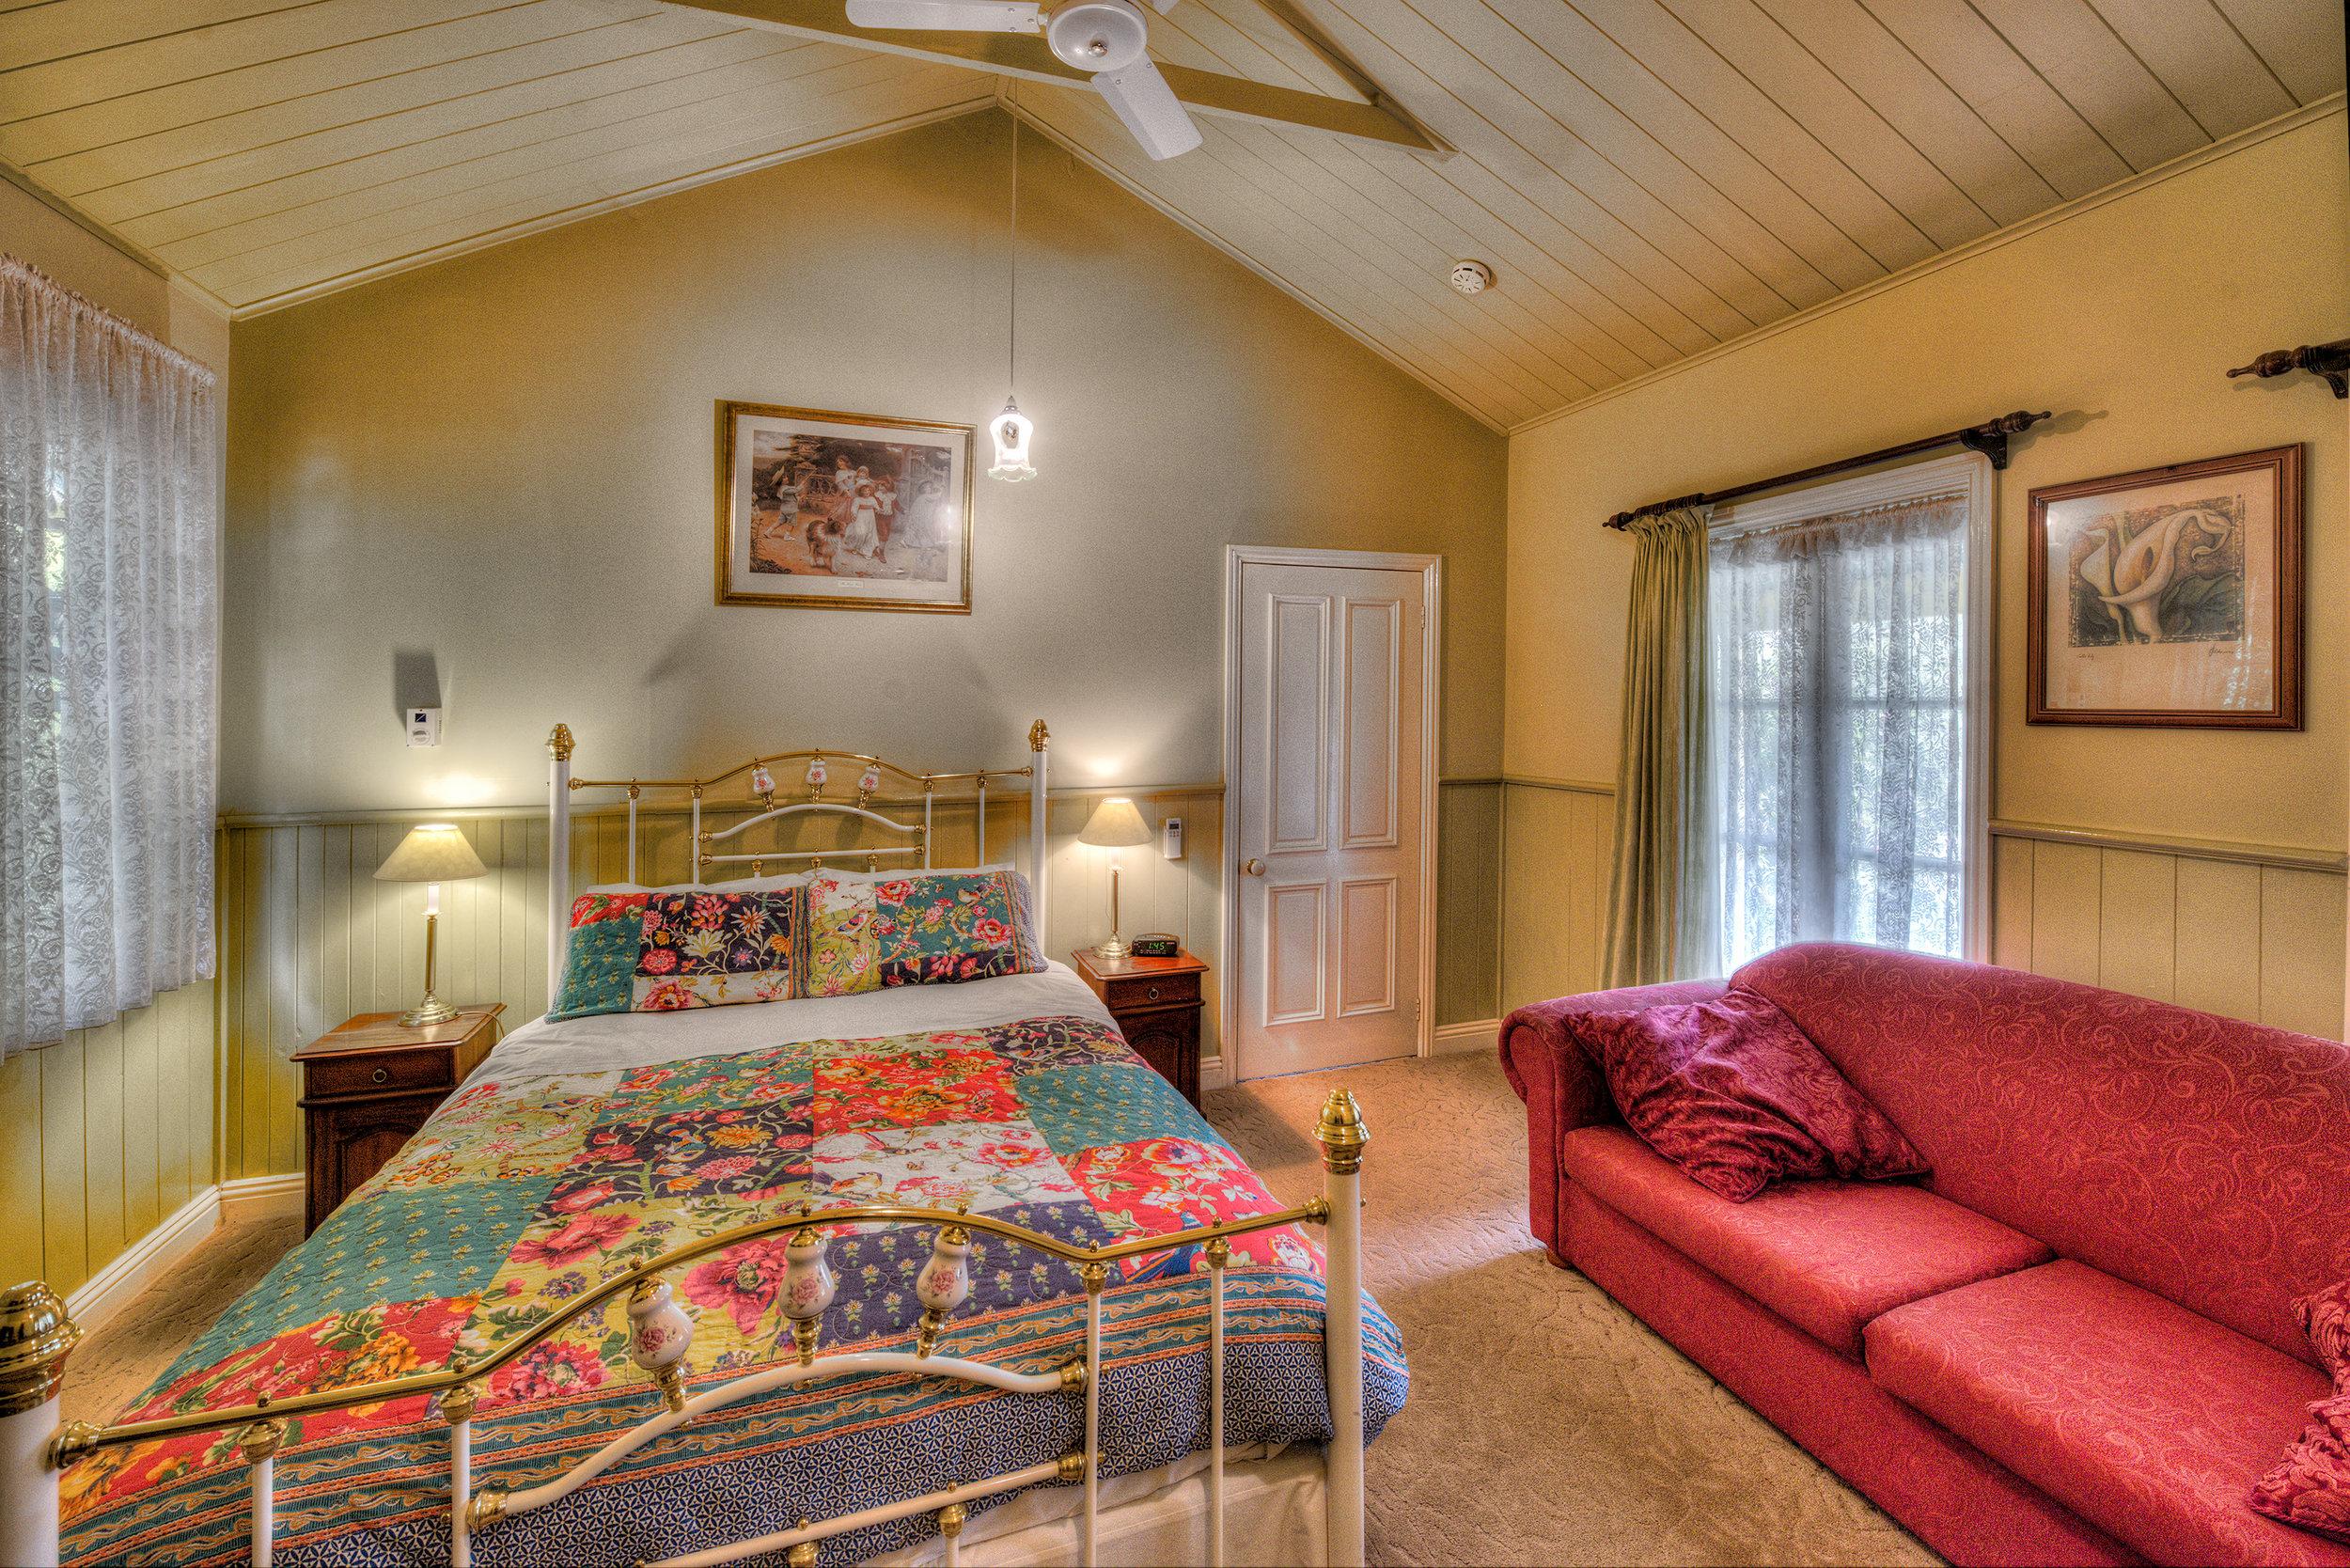 Robins-Nest-Bedroom 1.jpg